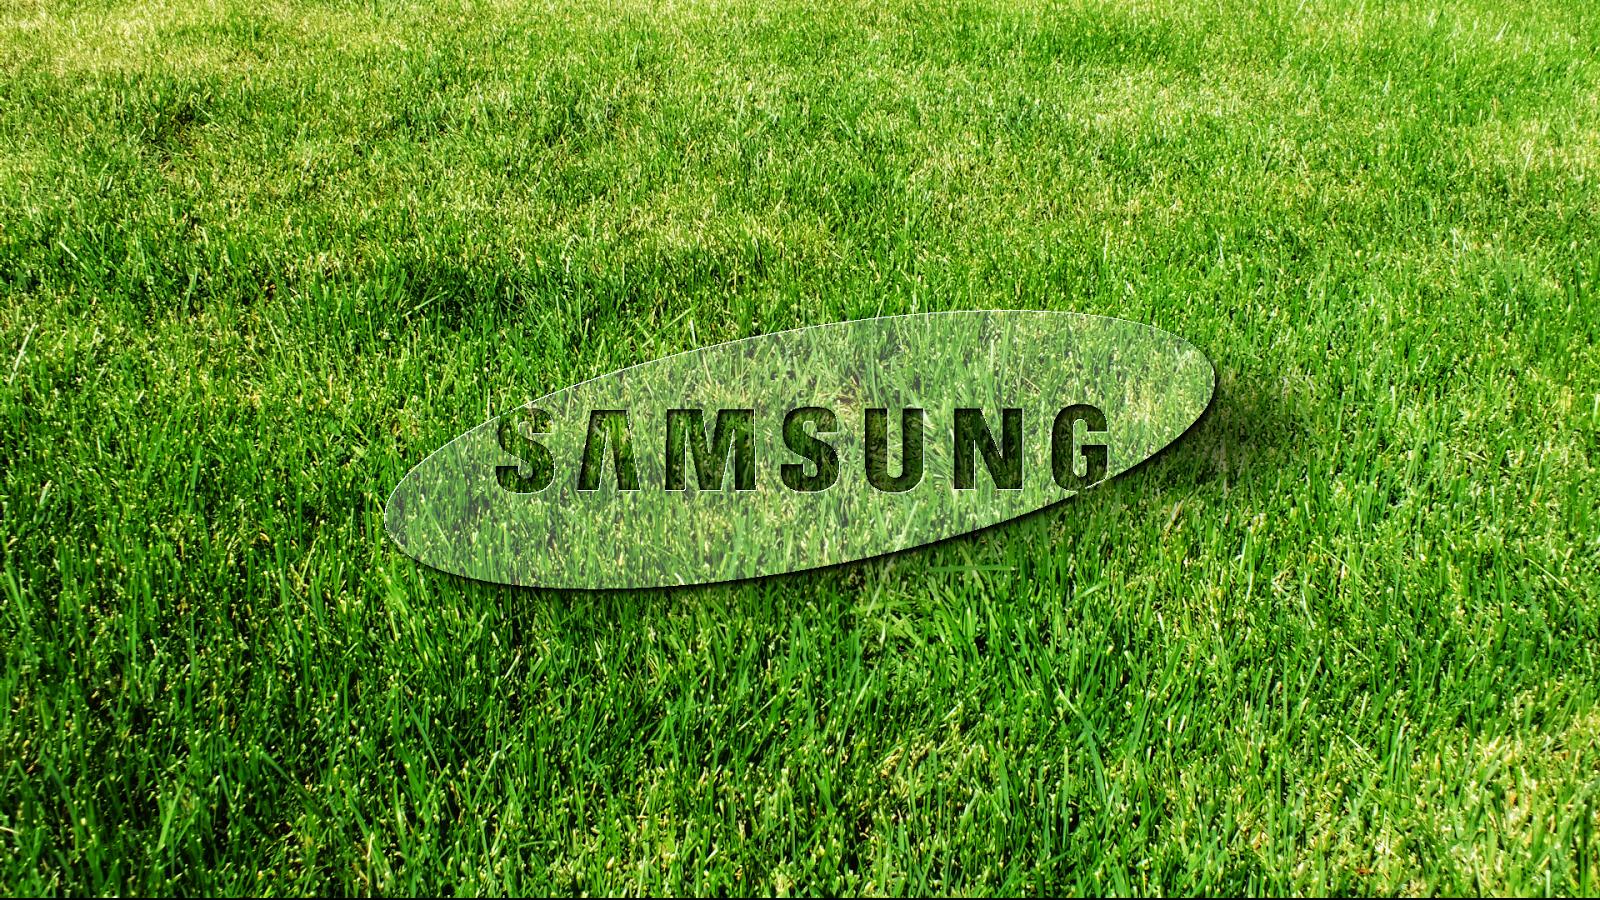 Samsung Wallpaper Hd 1080p: [67+] Samsung Logo Wallpaper On WallpaperSafari